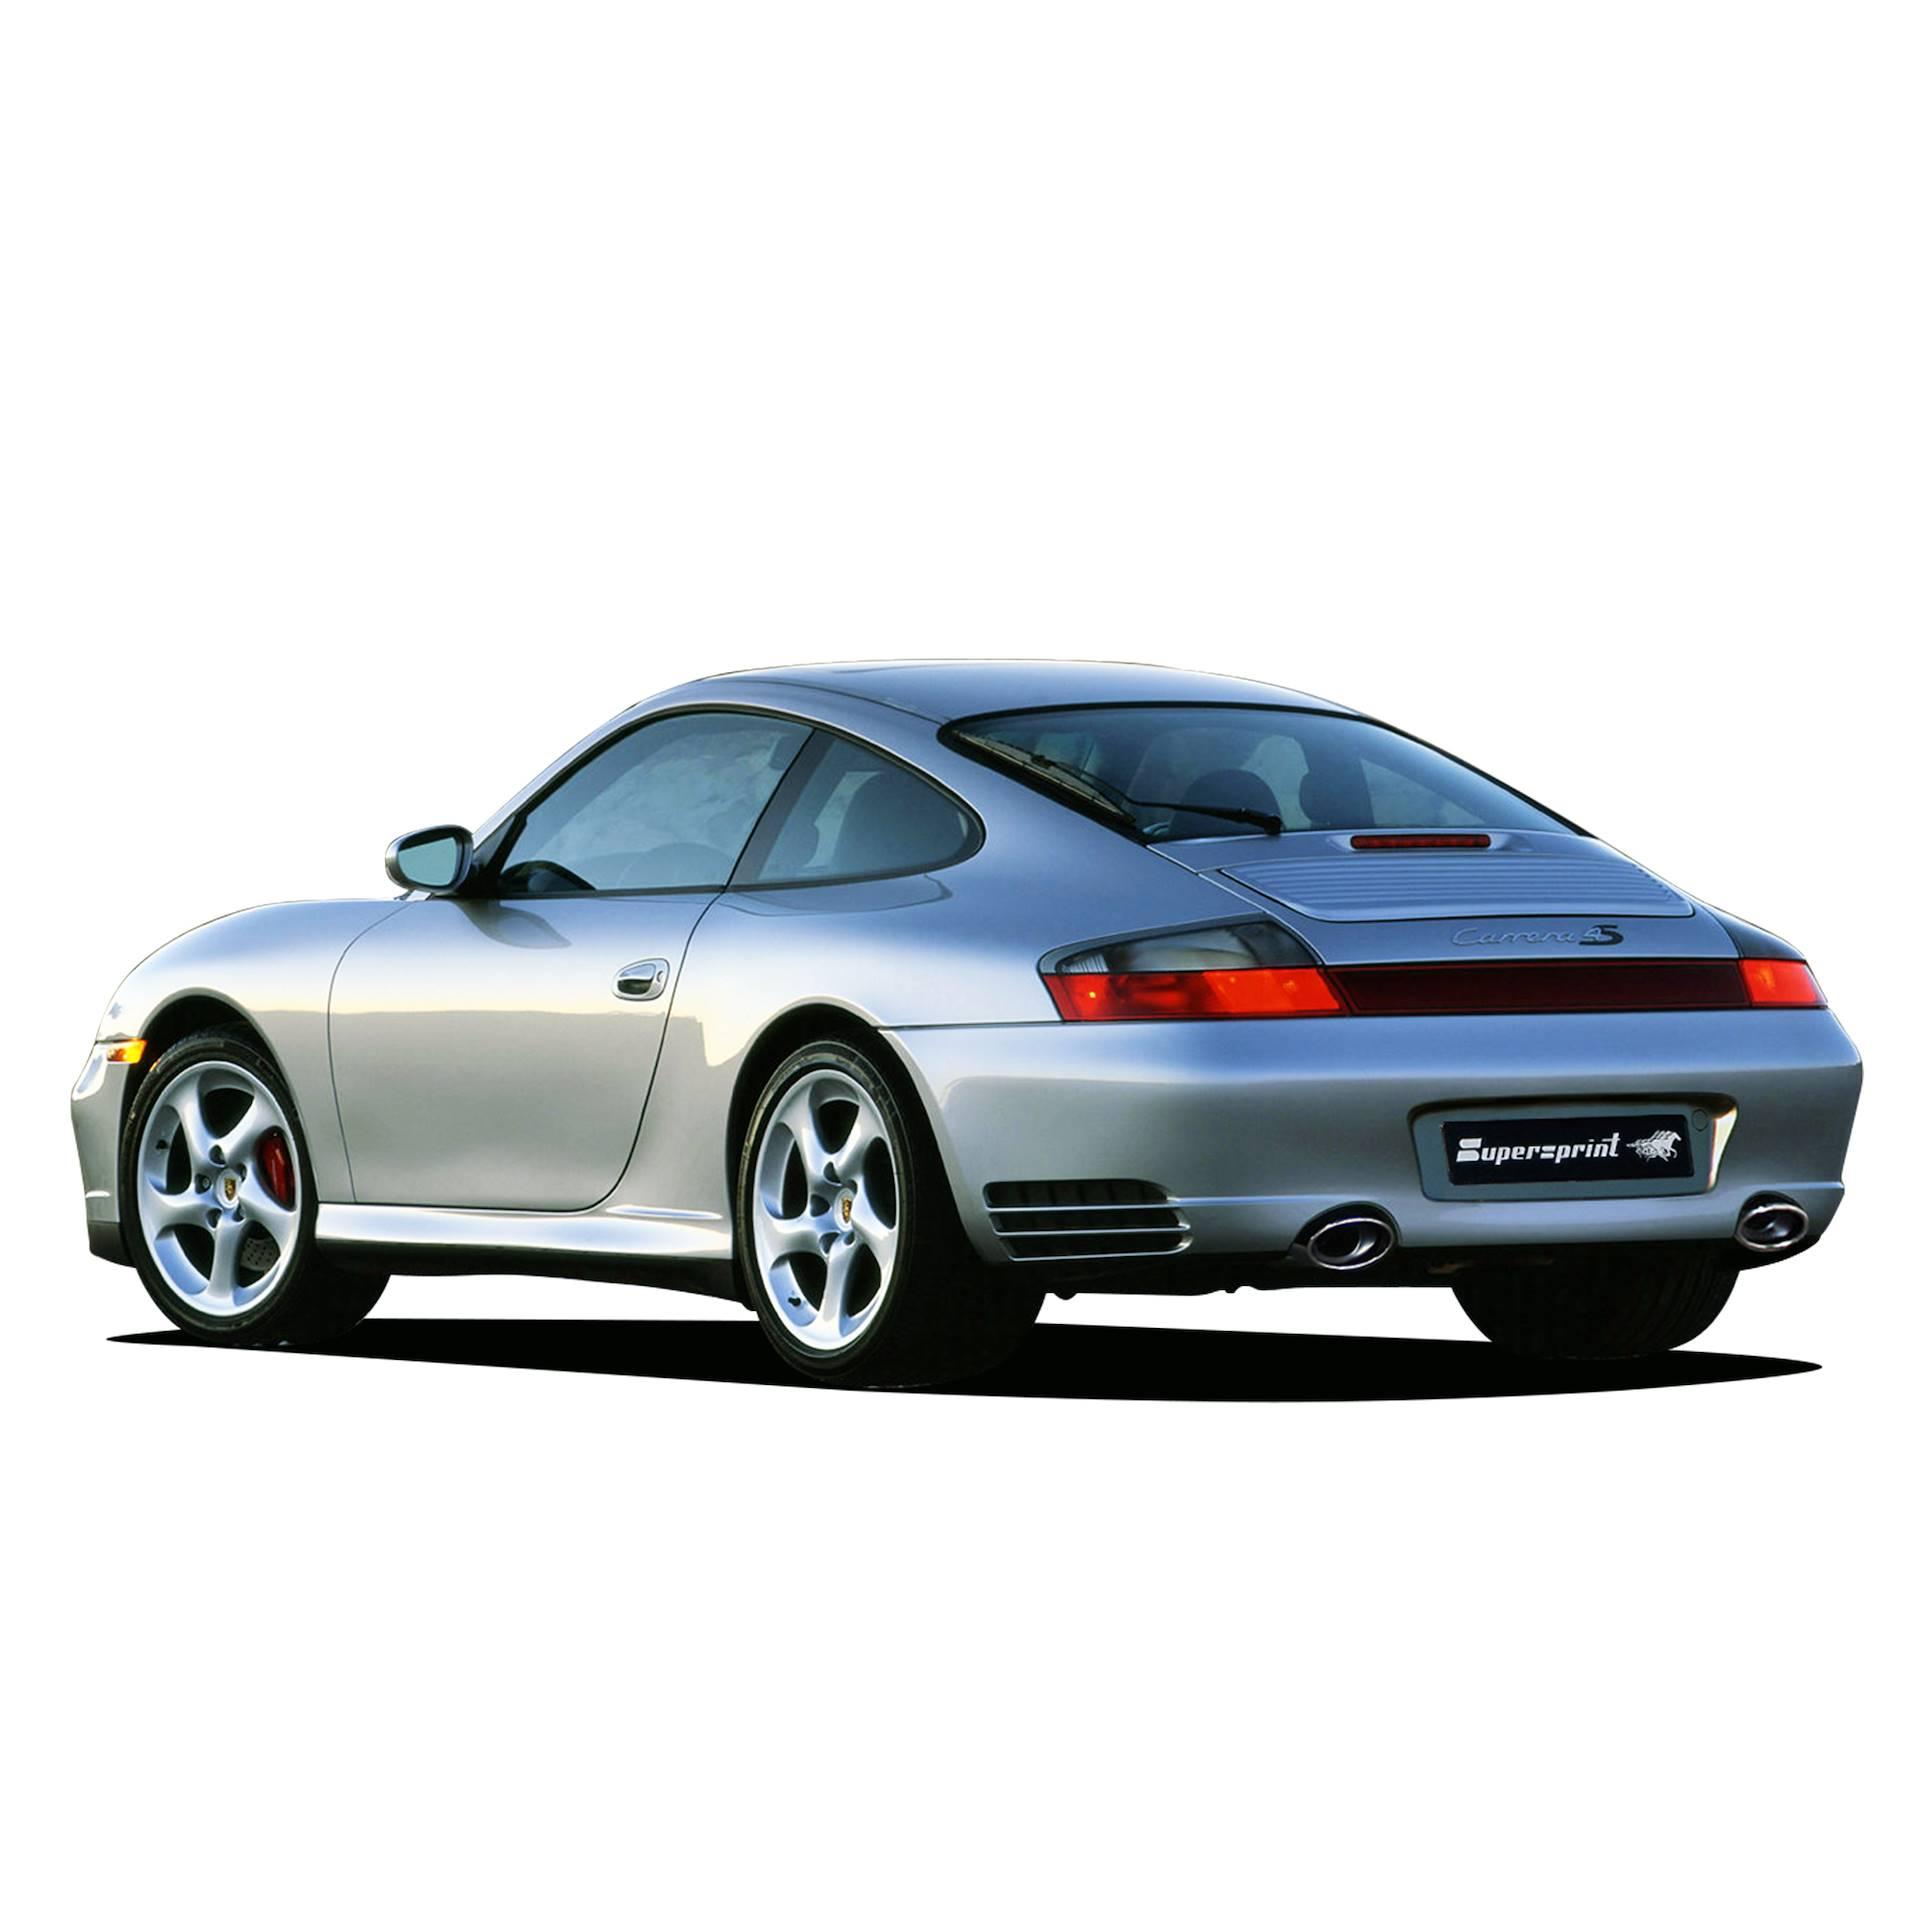 performance sport exhaust for porsche 911 996 carrera 4s porsche 996 carrera 4s 320 hp. Black Bedroom Furniture Sets. Home Design Ideas